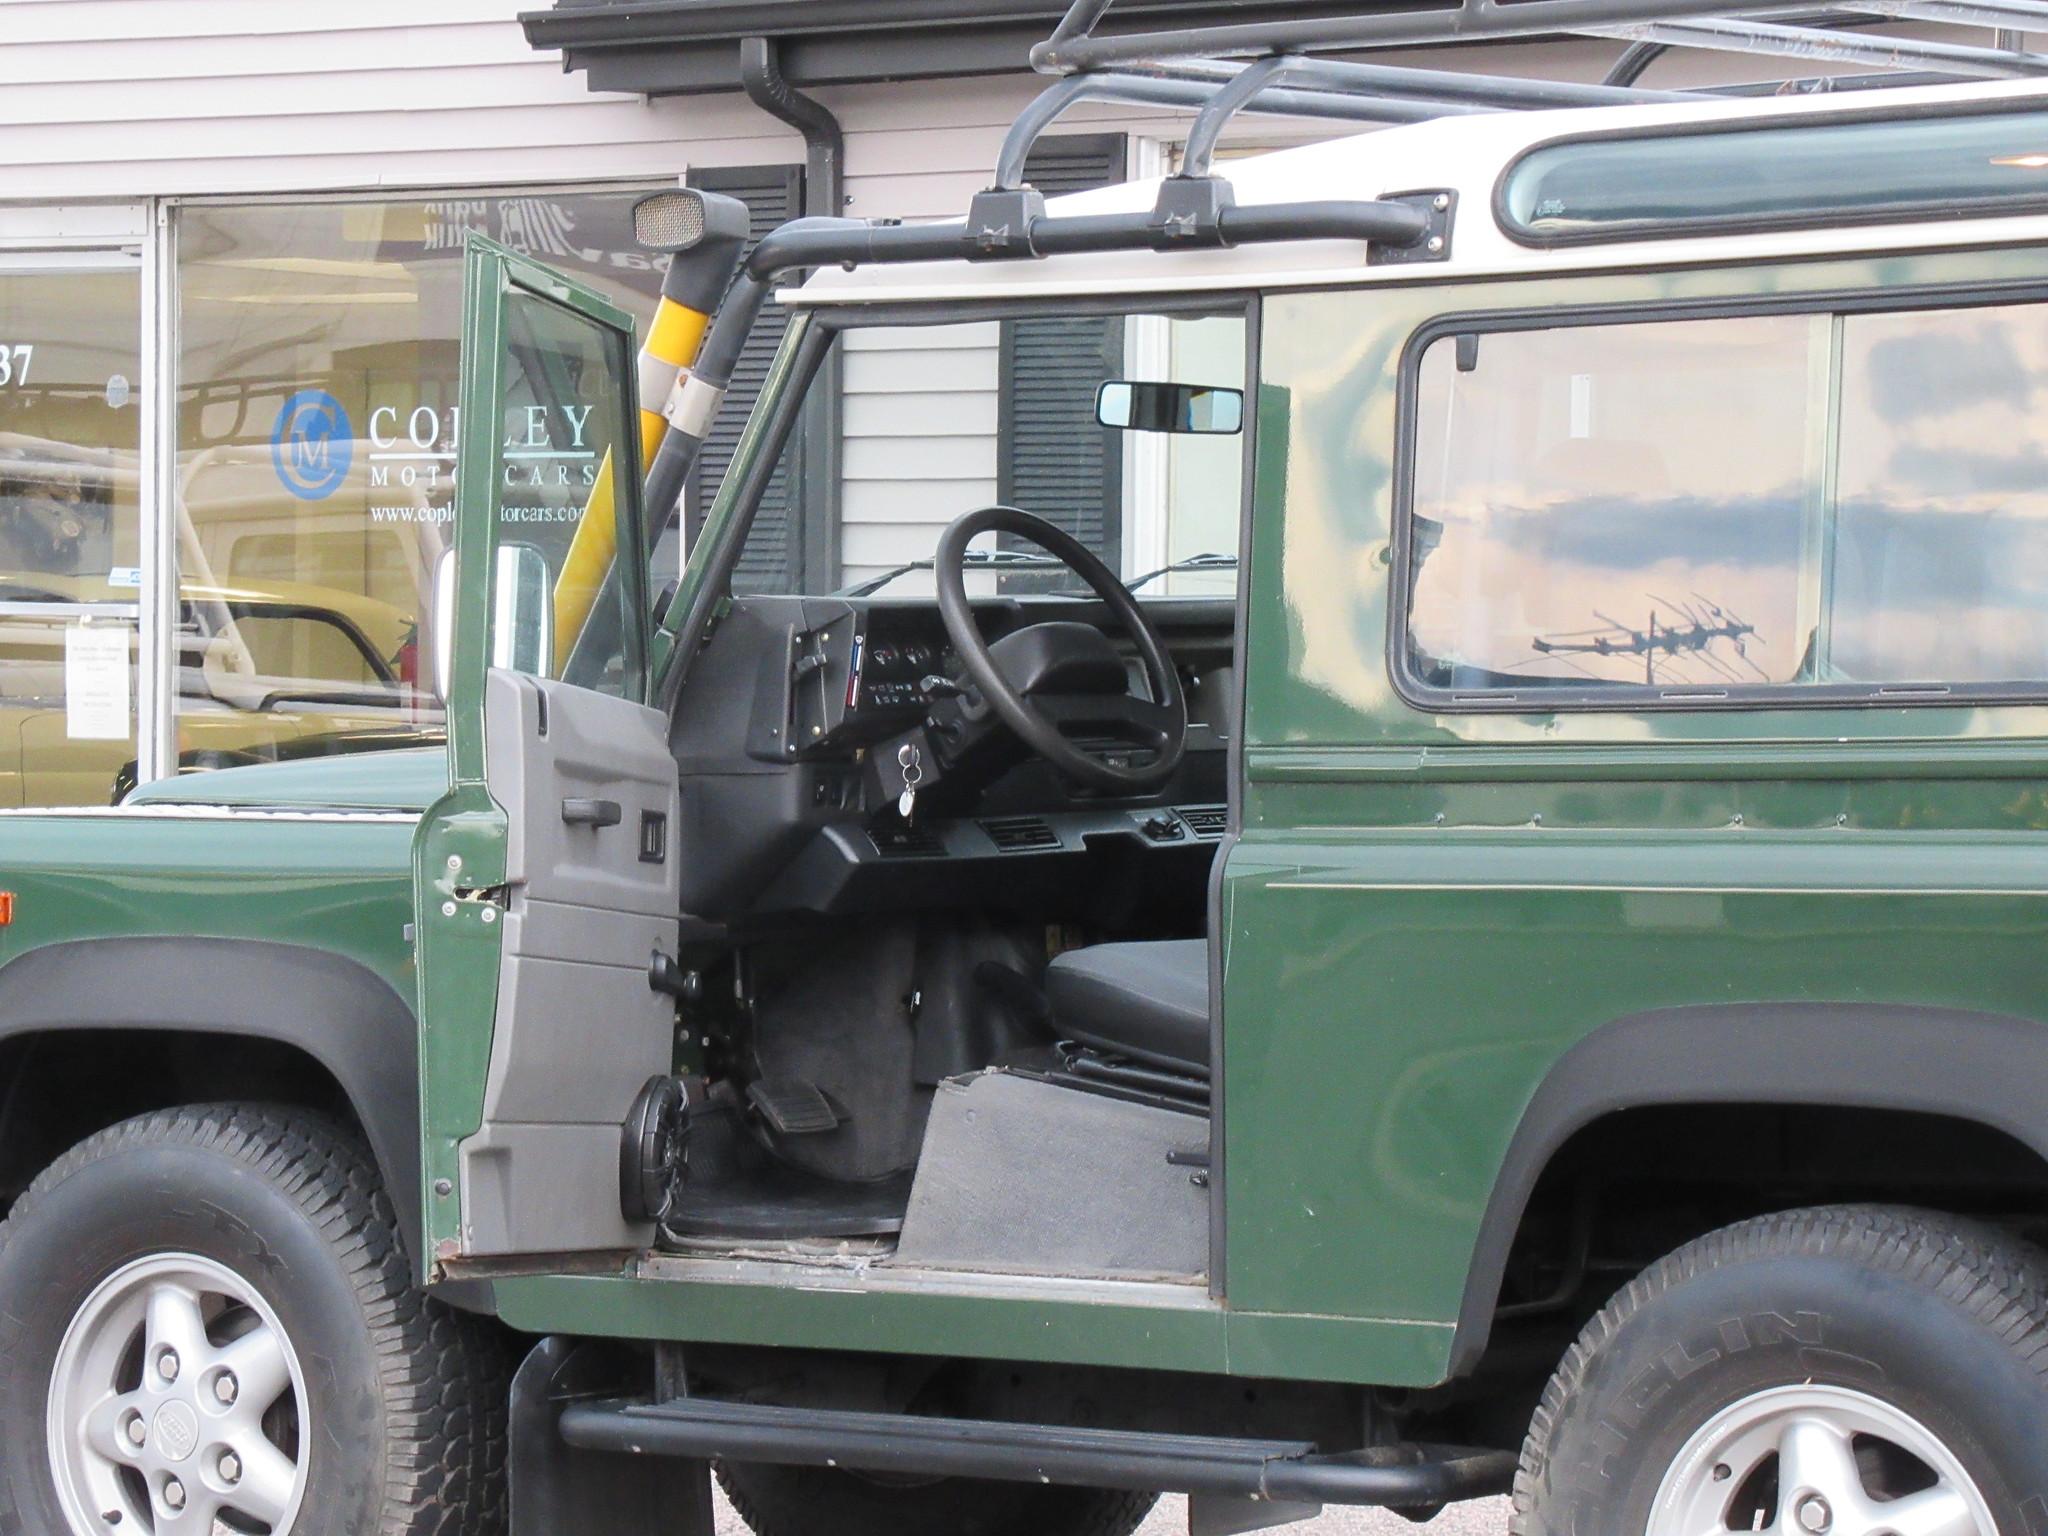 1997 Land Rover Nas Defender 90 Station Wagon Copley